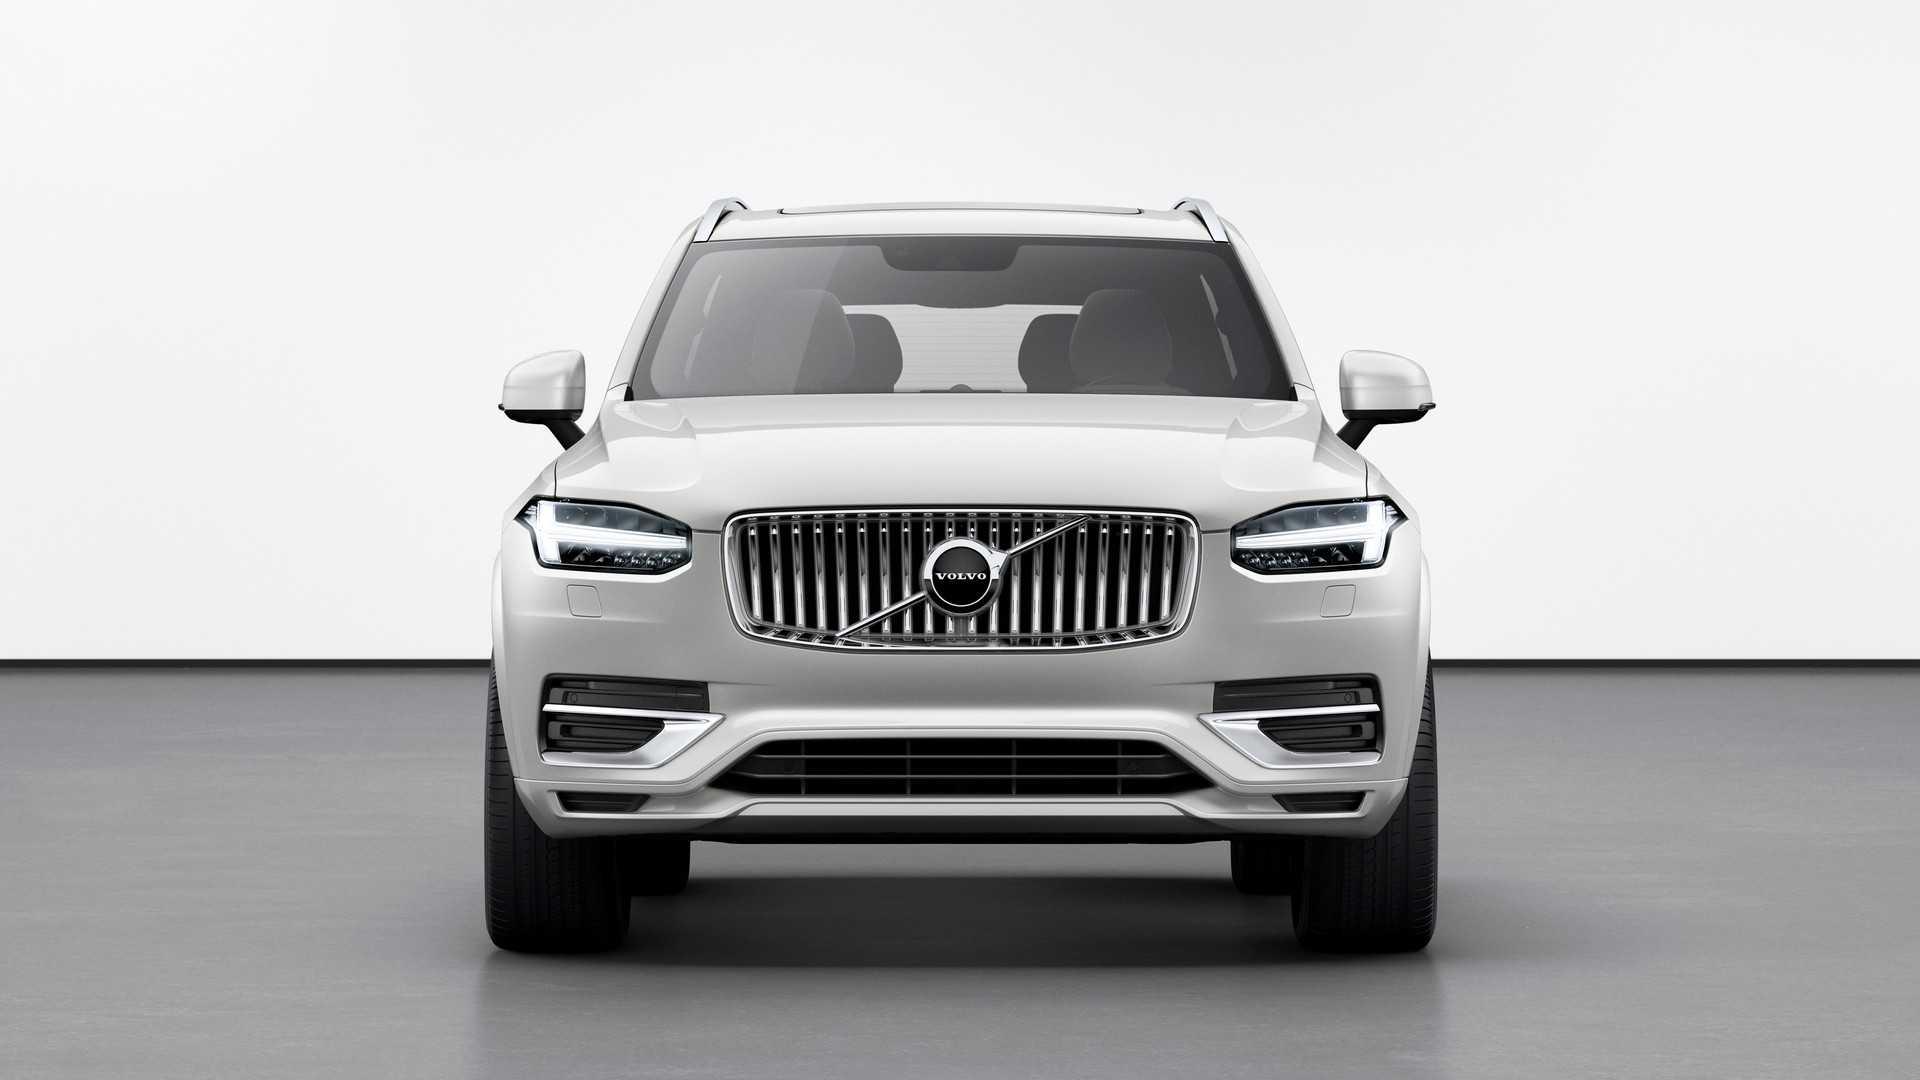 47 New Volvo S90 2020 Facelift Speed Test for Volvo S90 2020 Facelift